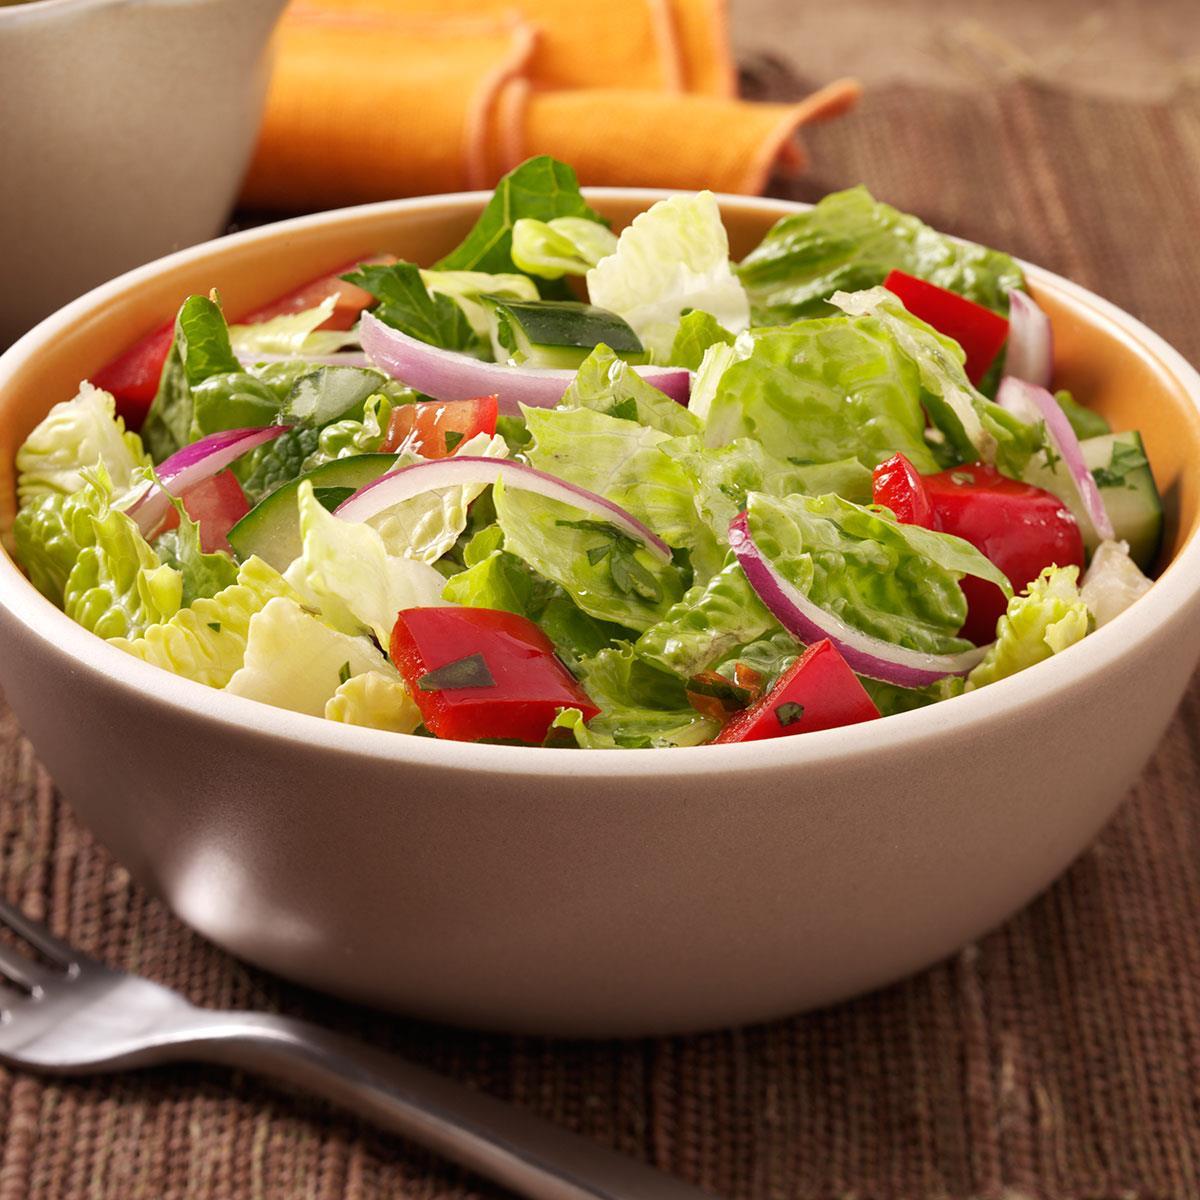 armenian garden salad recipe taste of home - Garden Salad Recipe